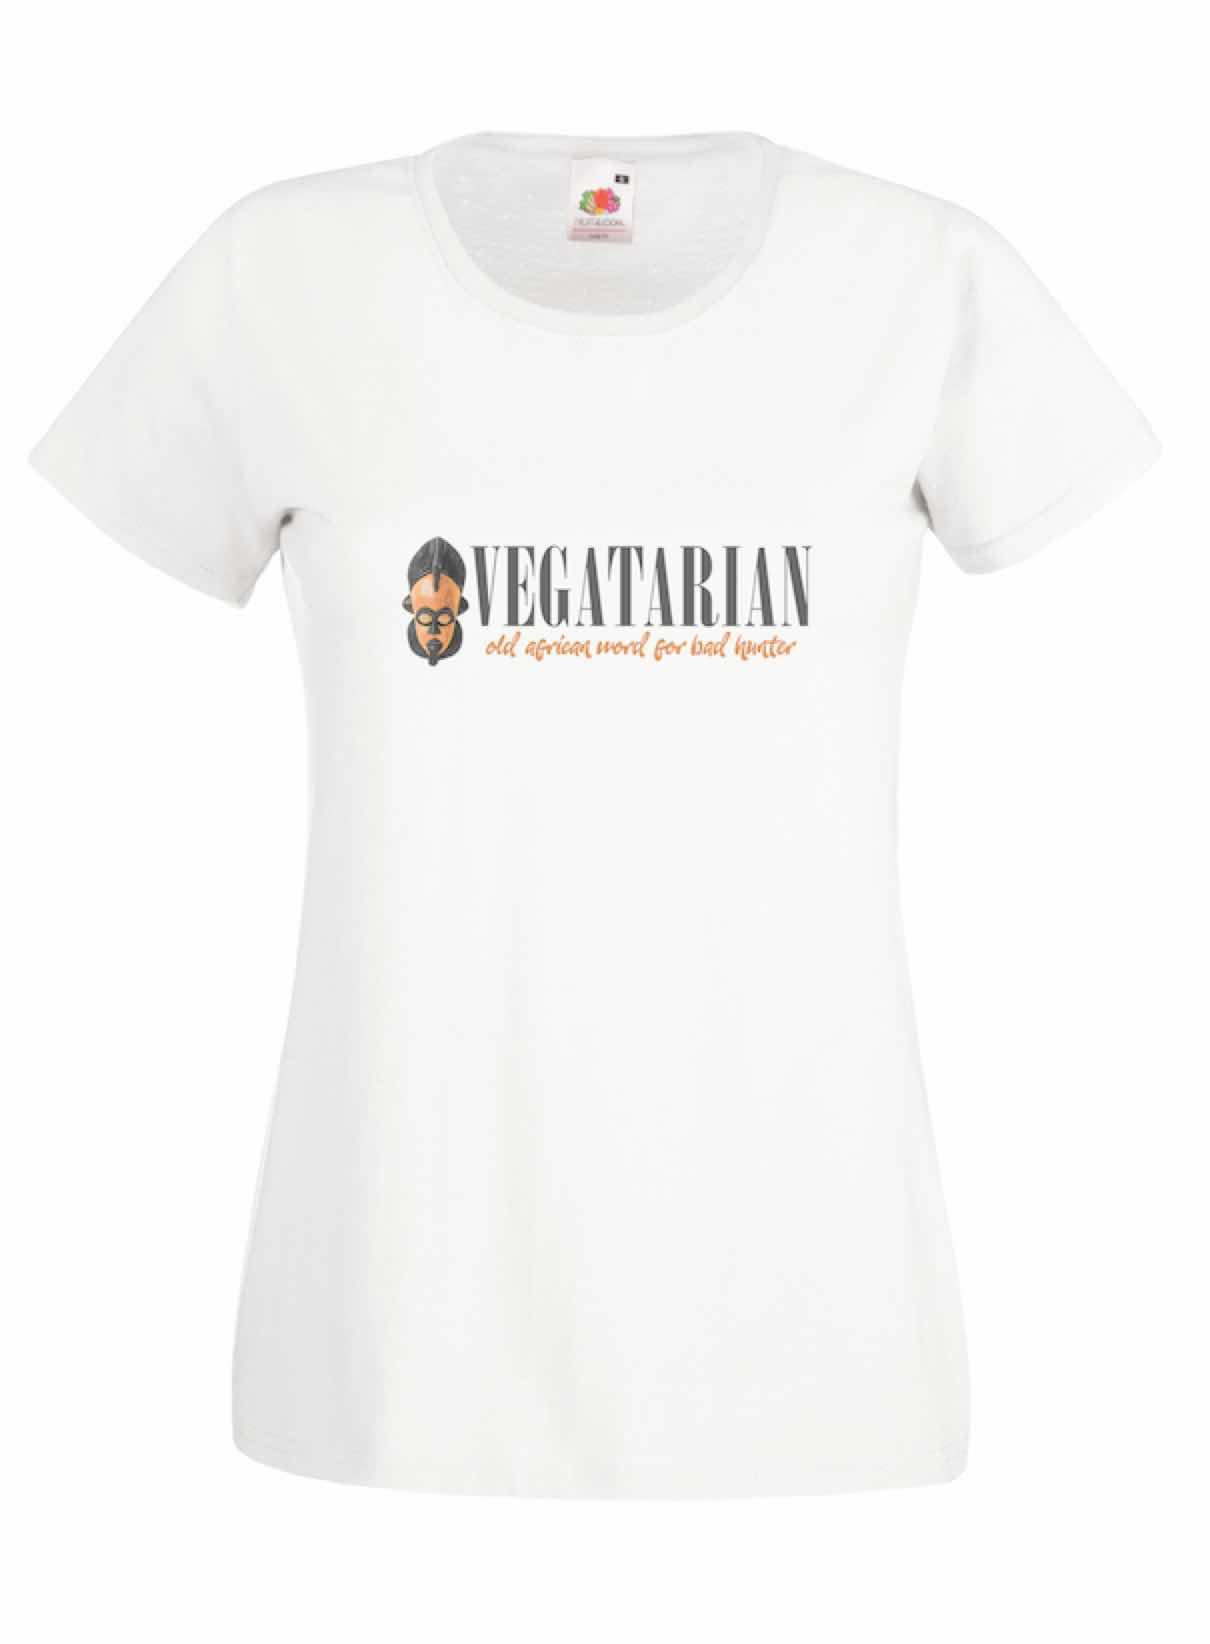 Vegetarian design for t-shirt, hoodie & sweatshirt